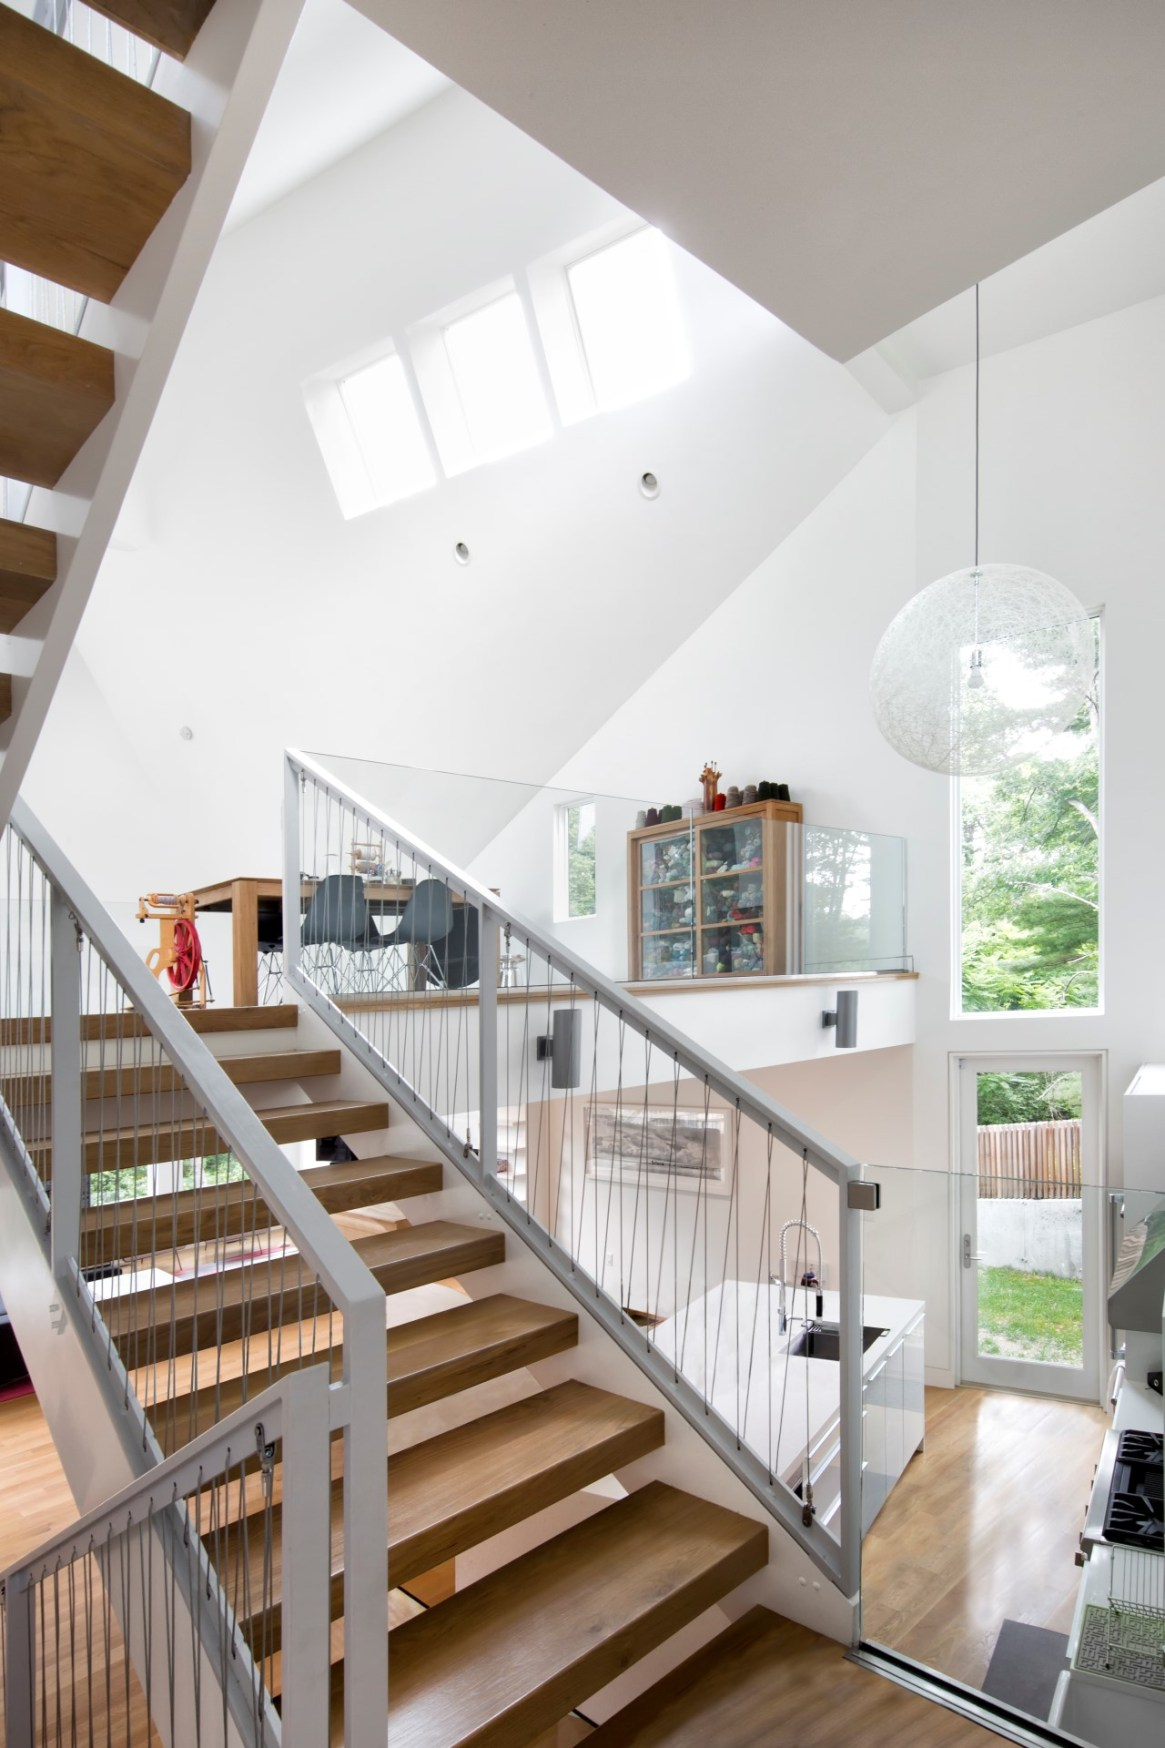 tung house stair